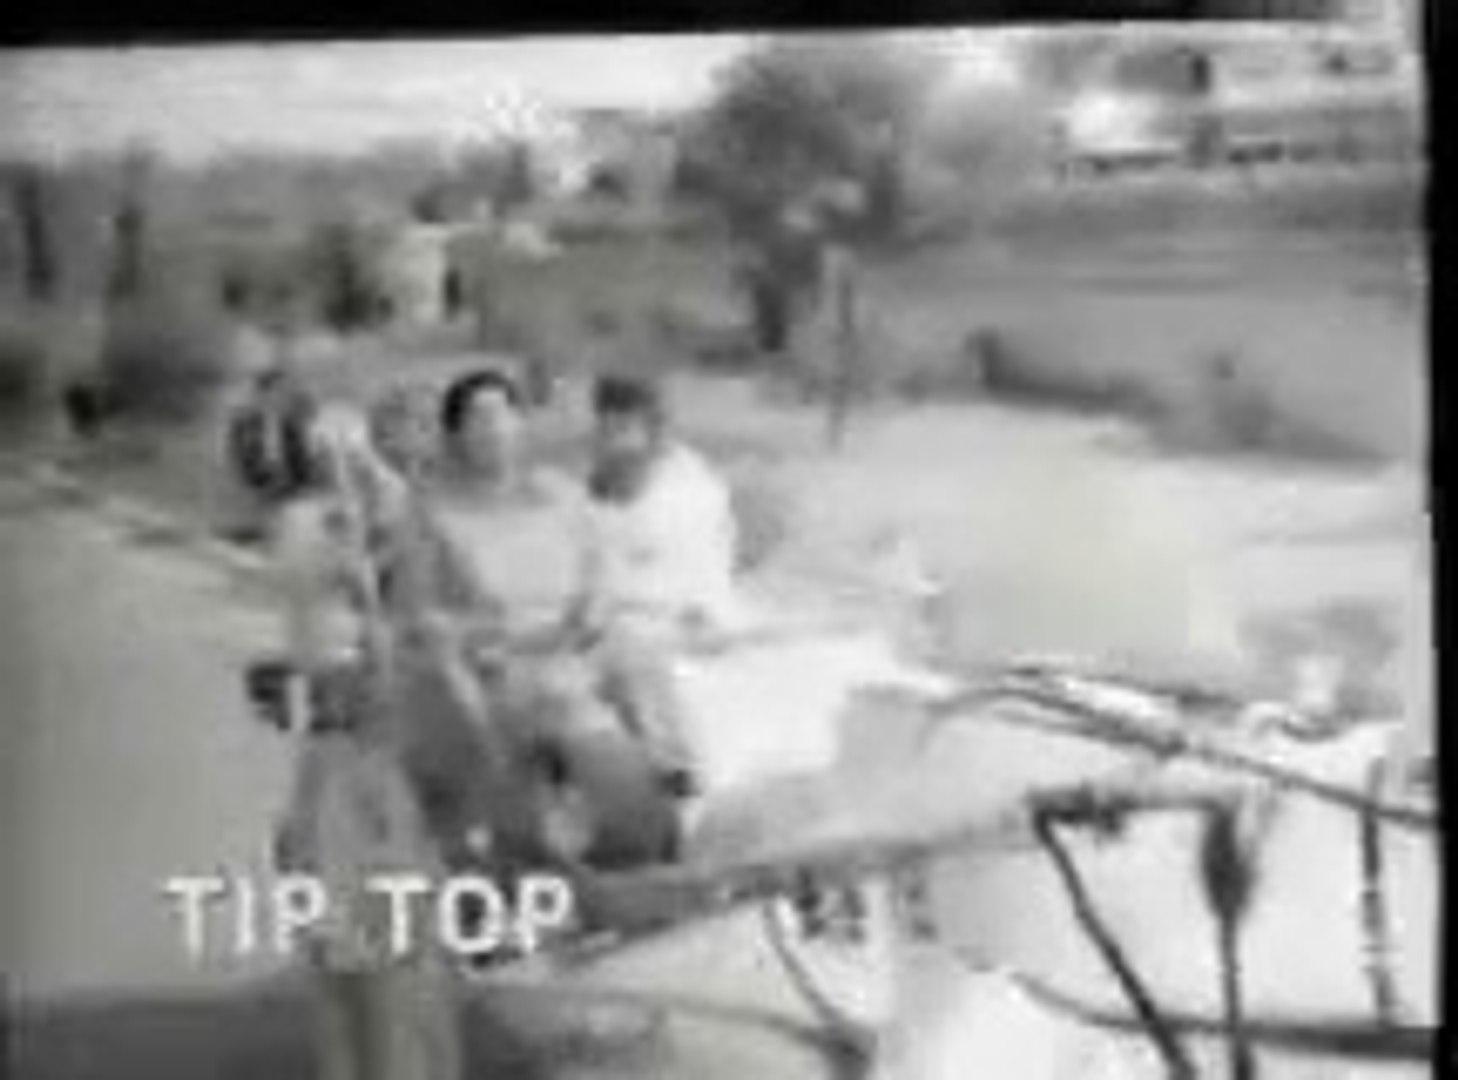 Tangay Da Badshah, Inayat Hussain Bhatti Late, Punjabi, Cultural, Old, Film, Song(Risingformuli)